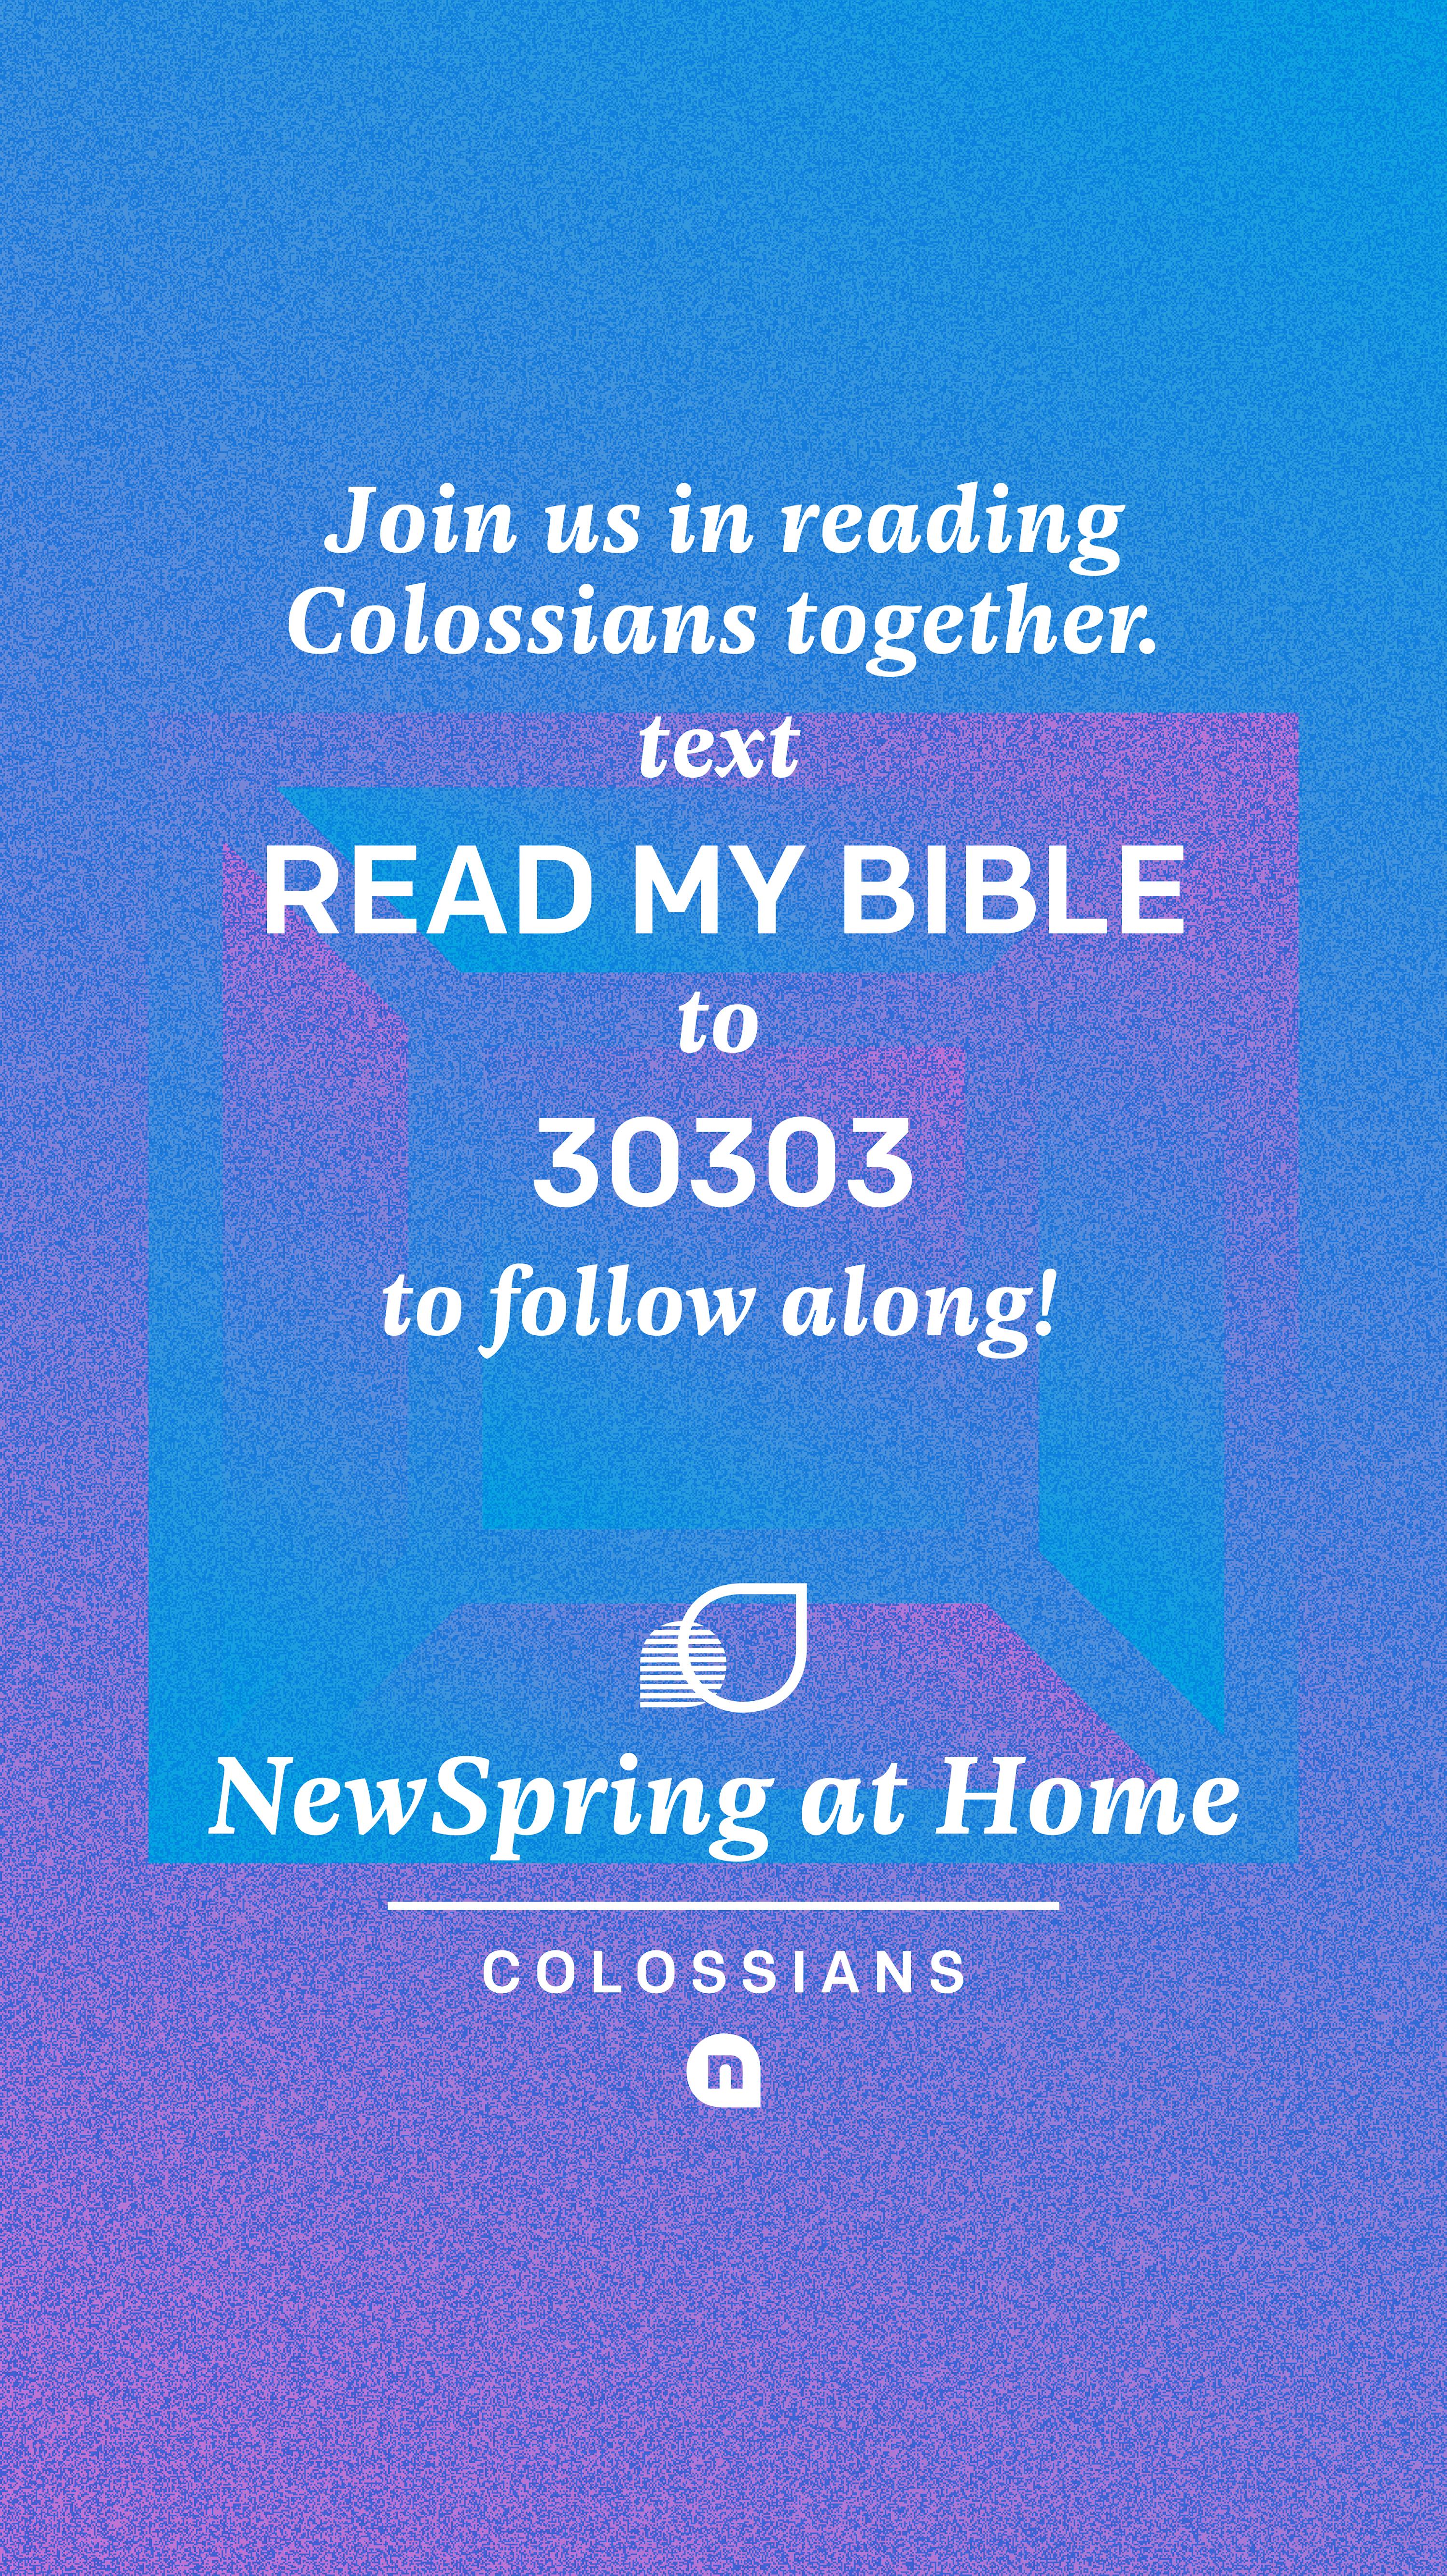 11917.cen.social.colossians.promotiles-04.png